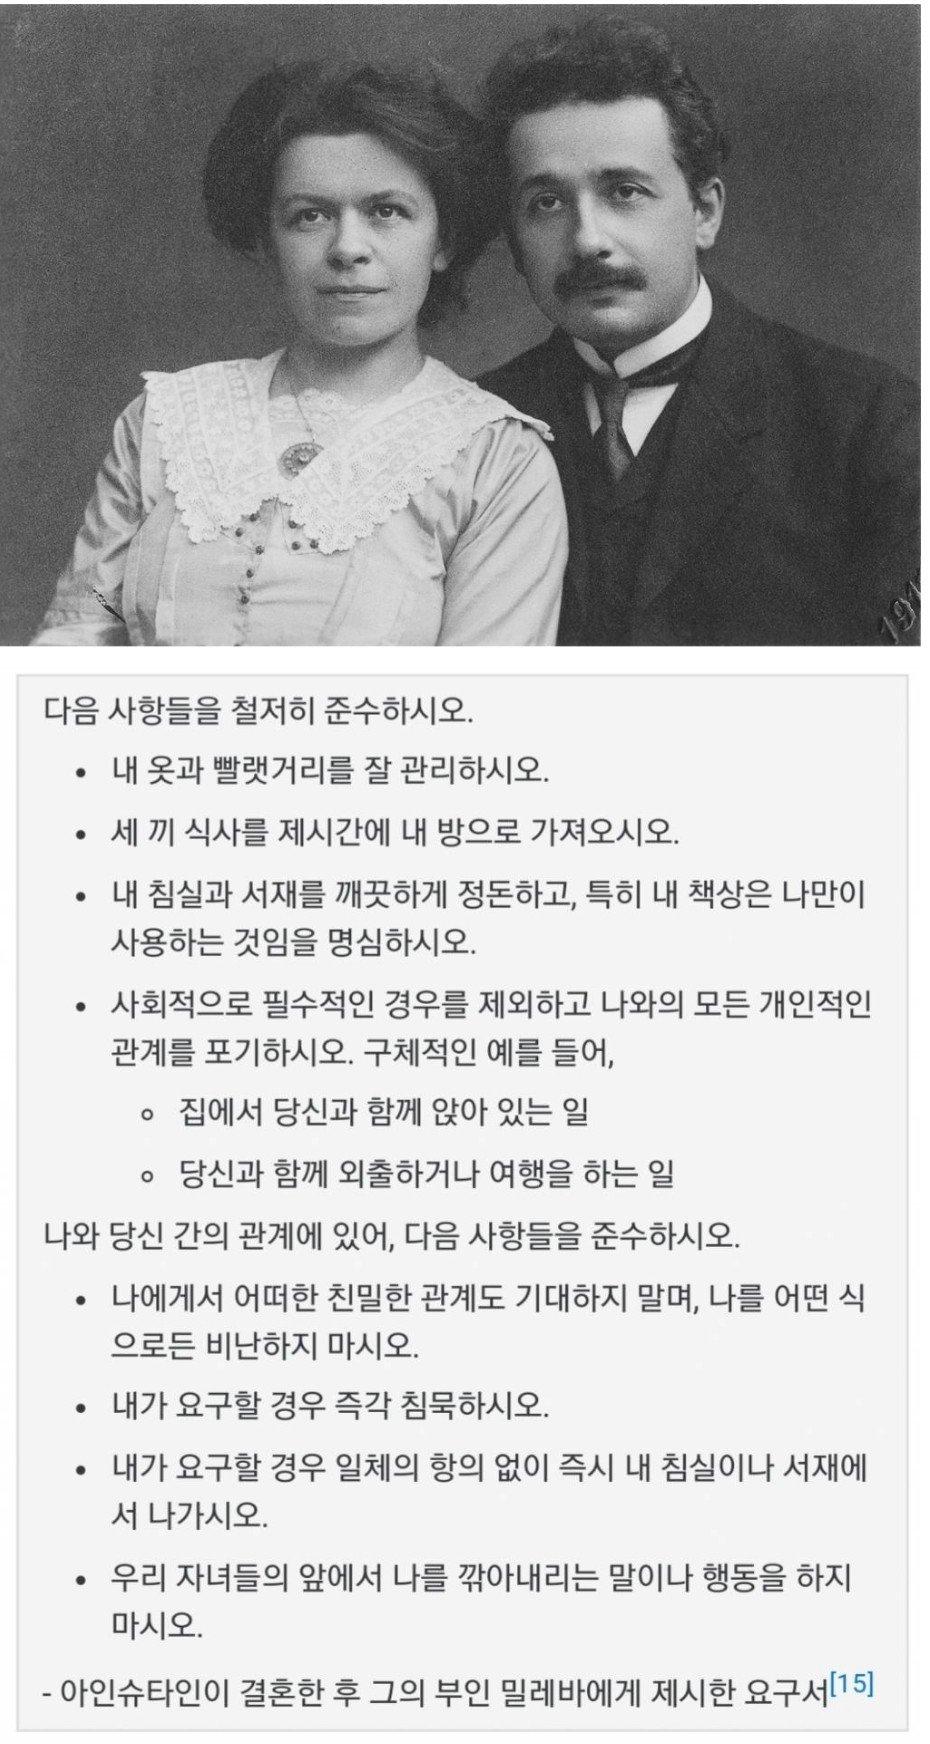 20180112_130323.jpg 아인슈타인이 부인에게 요구한 결혼생활 규칙